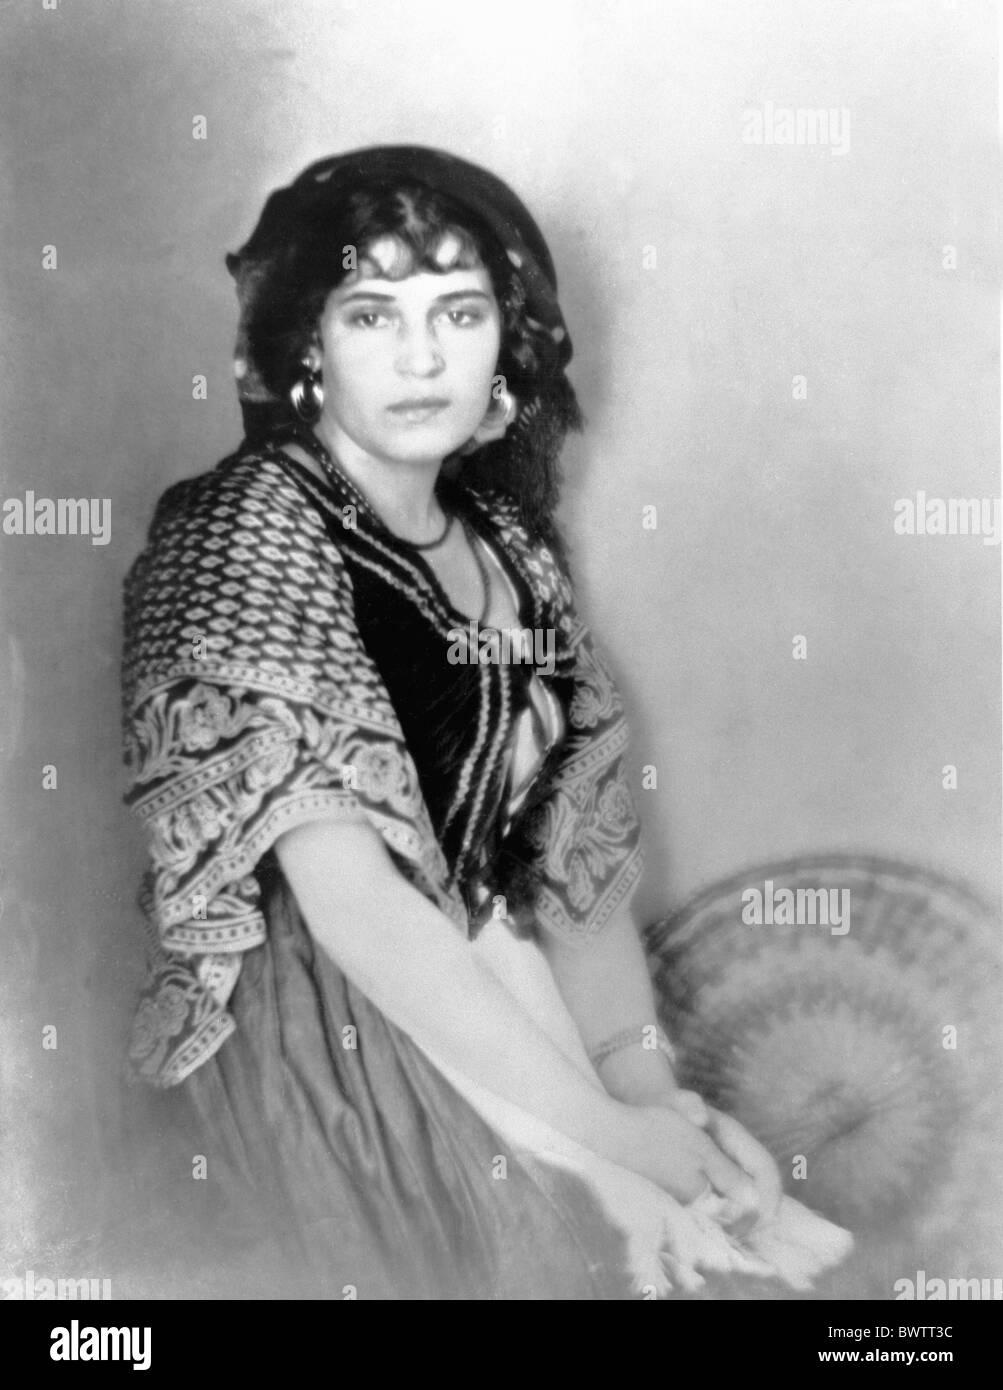 Tina Modotti artist portrait woman 1919 photography history historic historical culture art - Stock Image